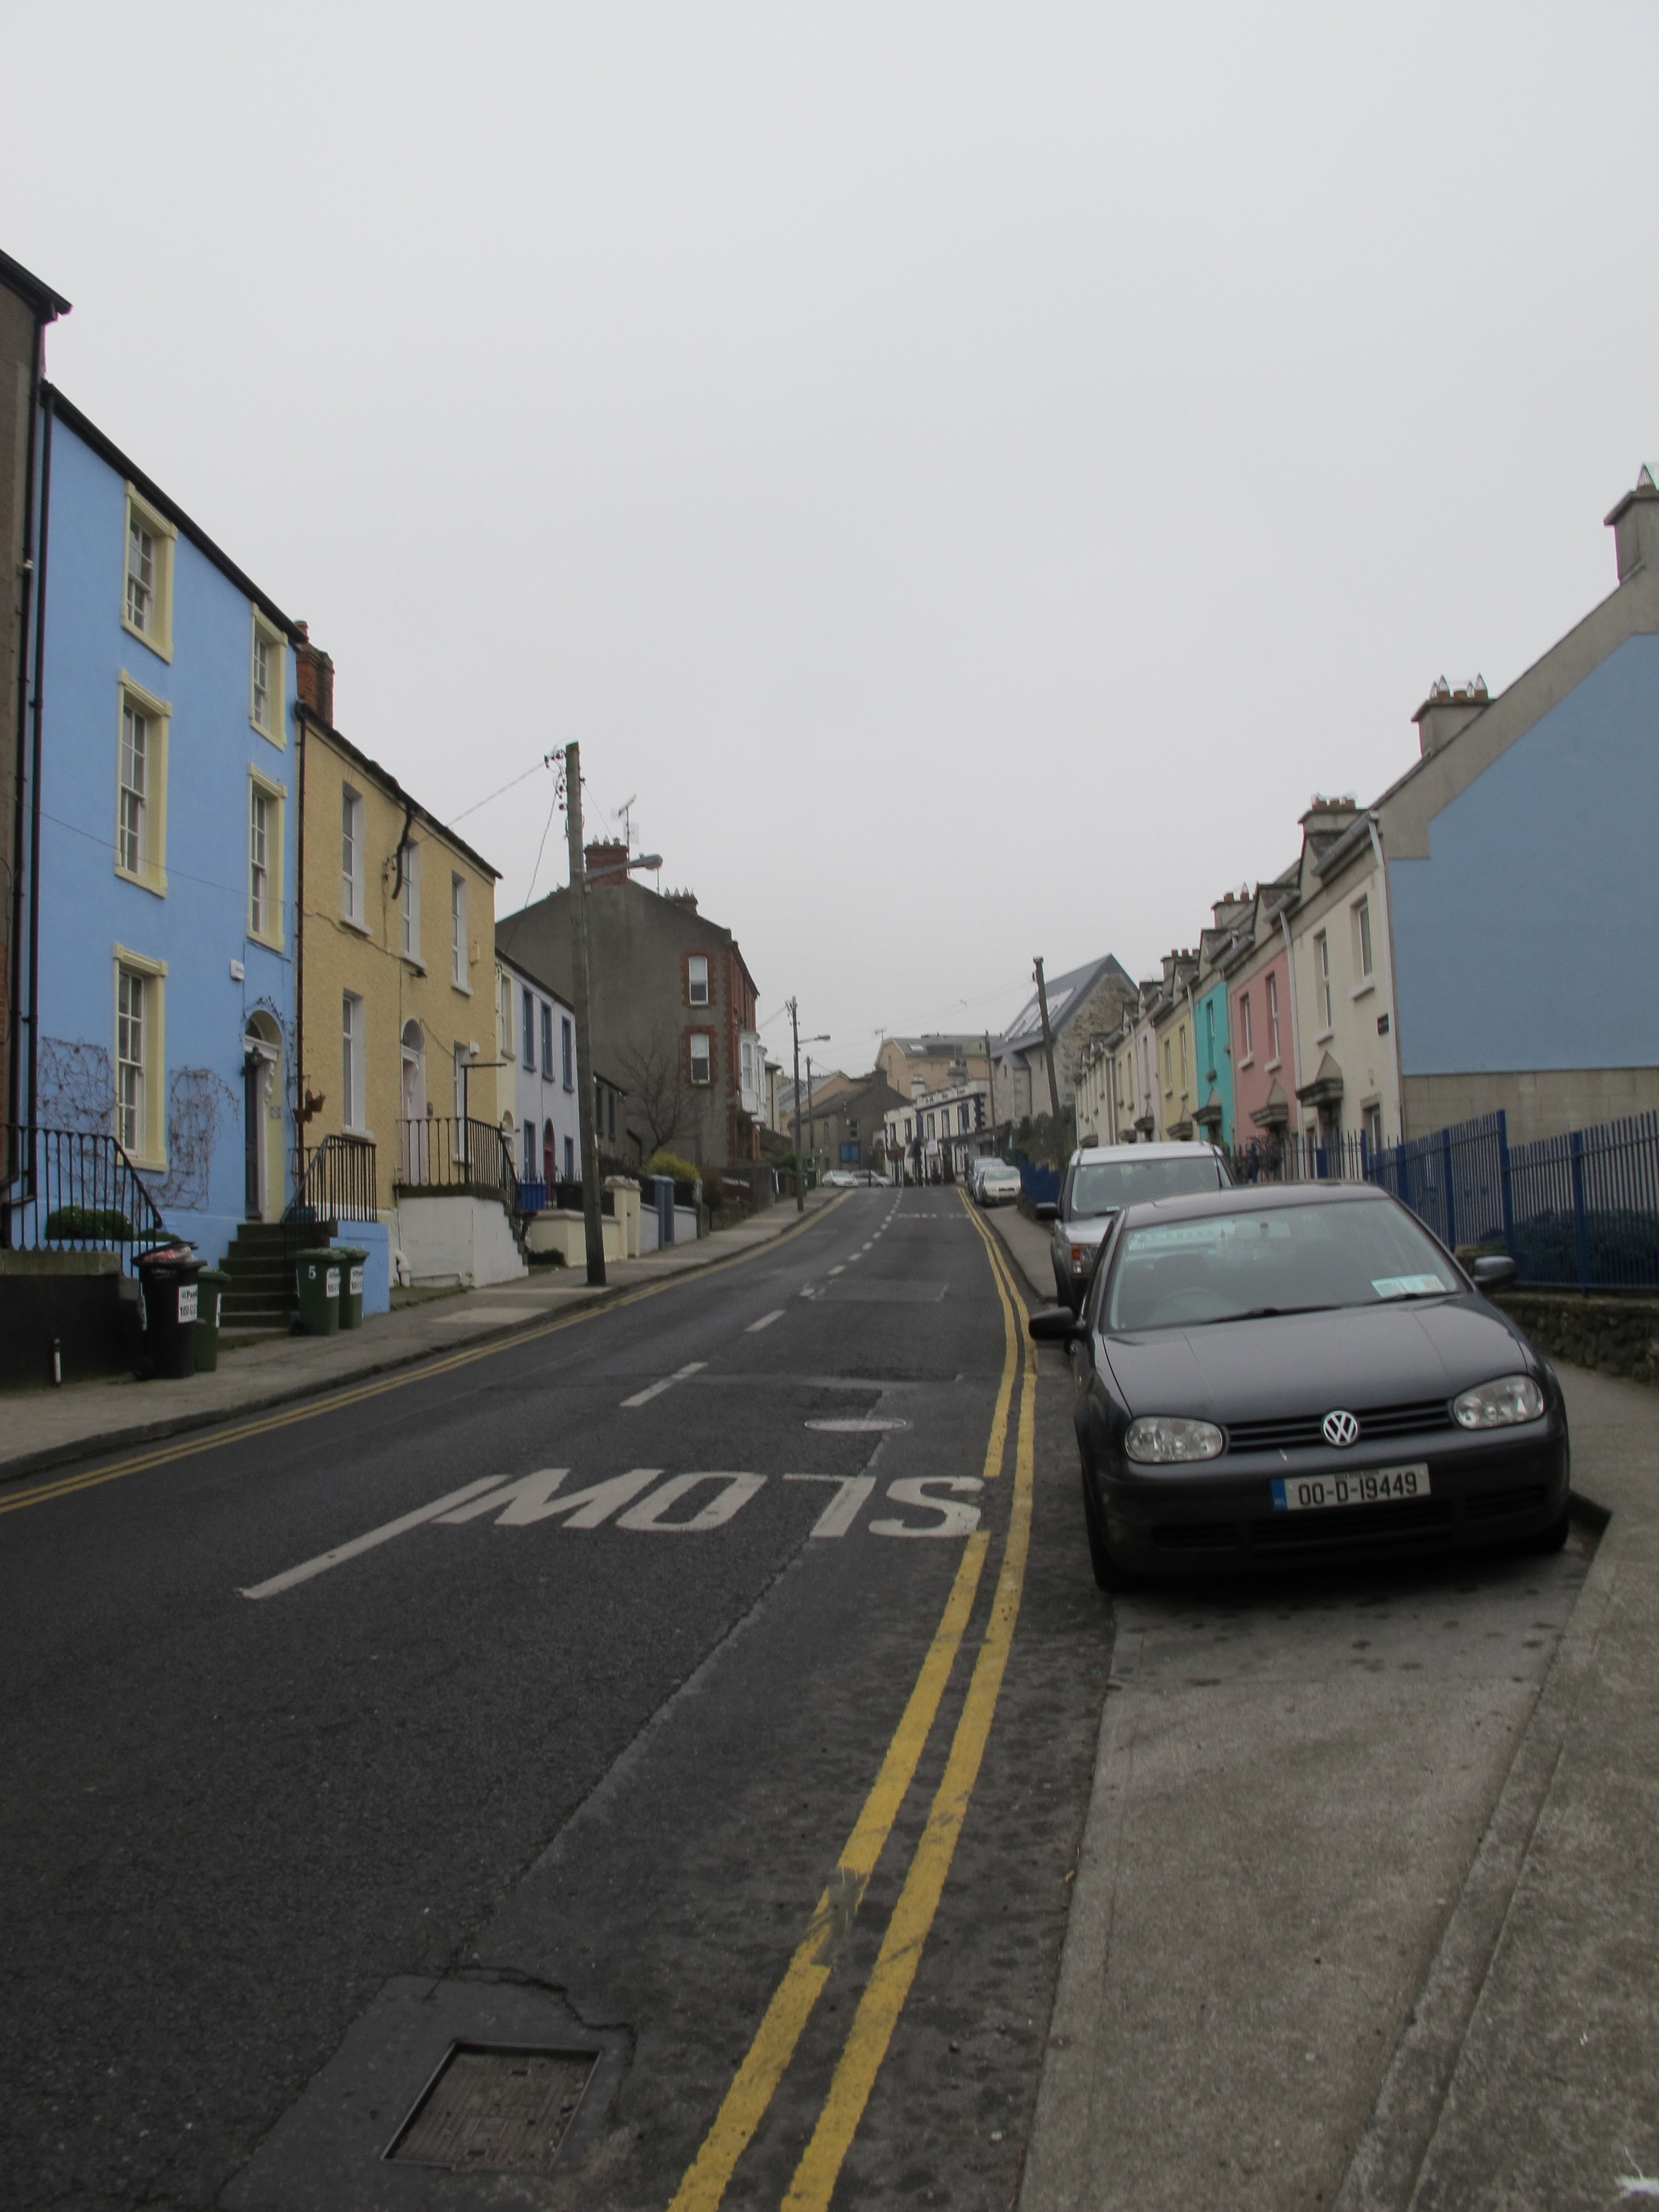 Ireland Again